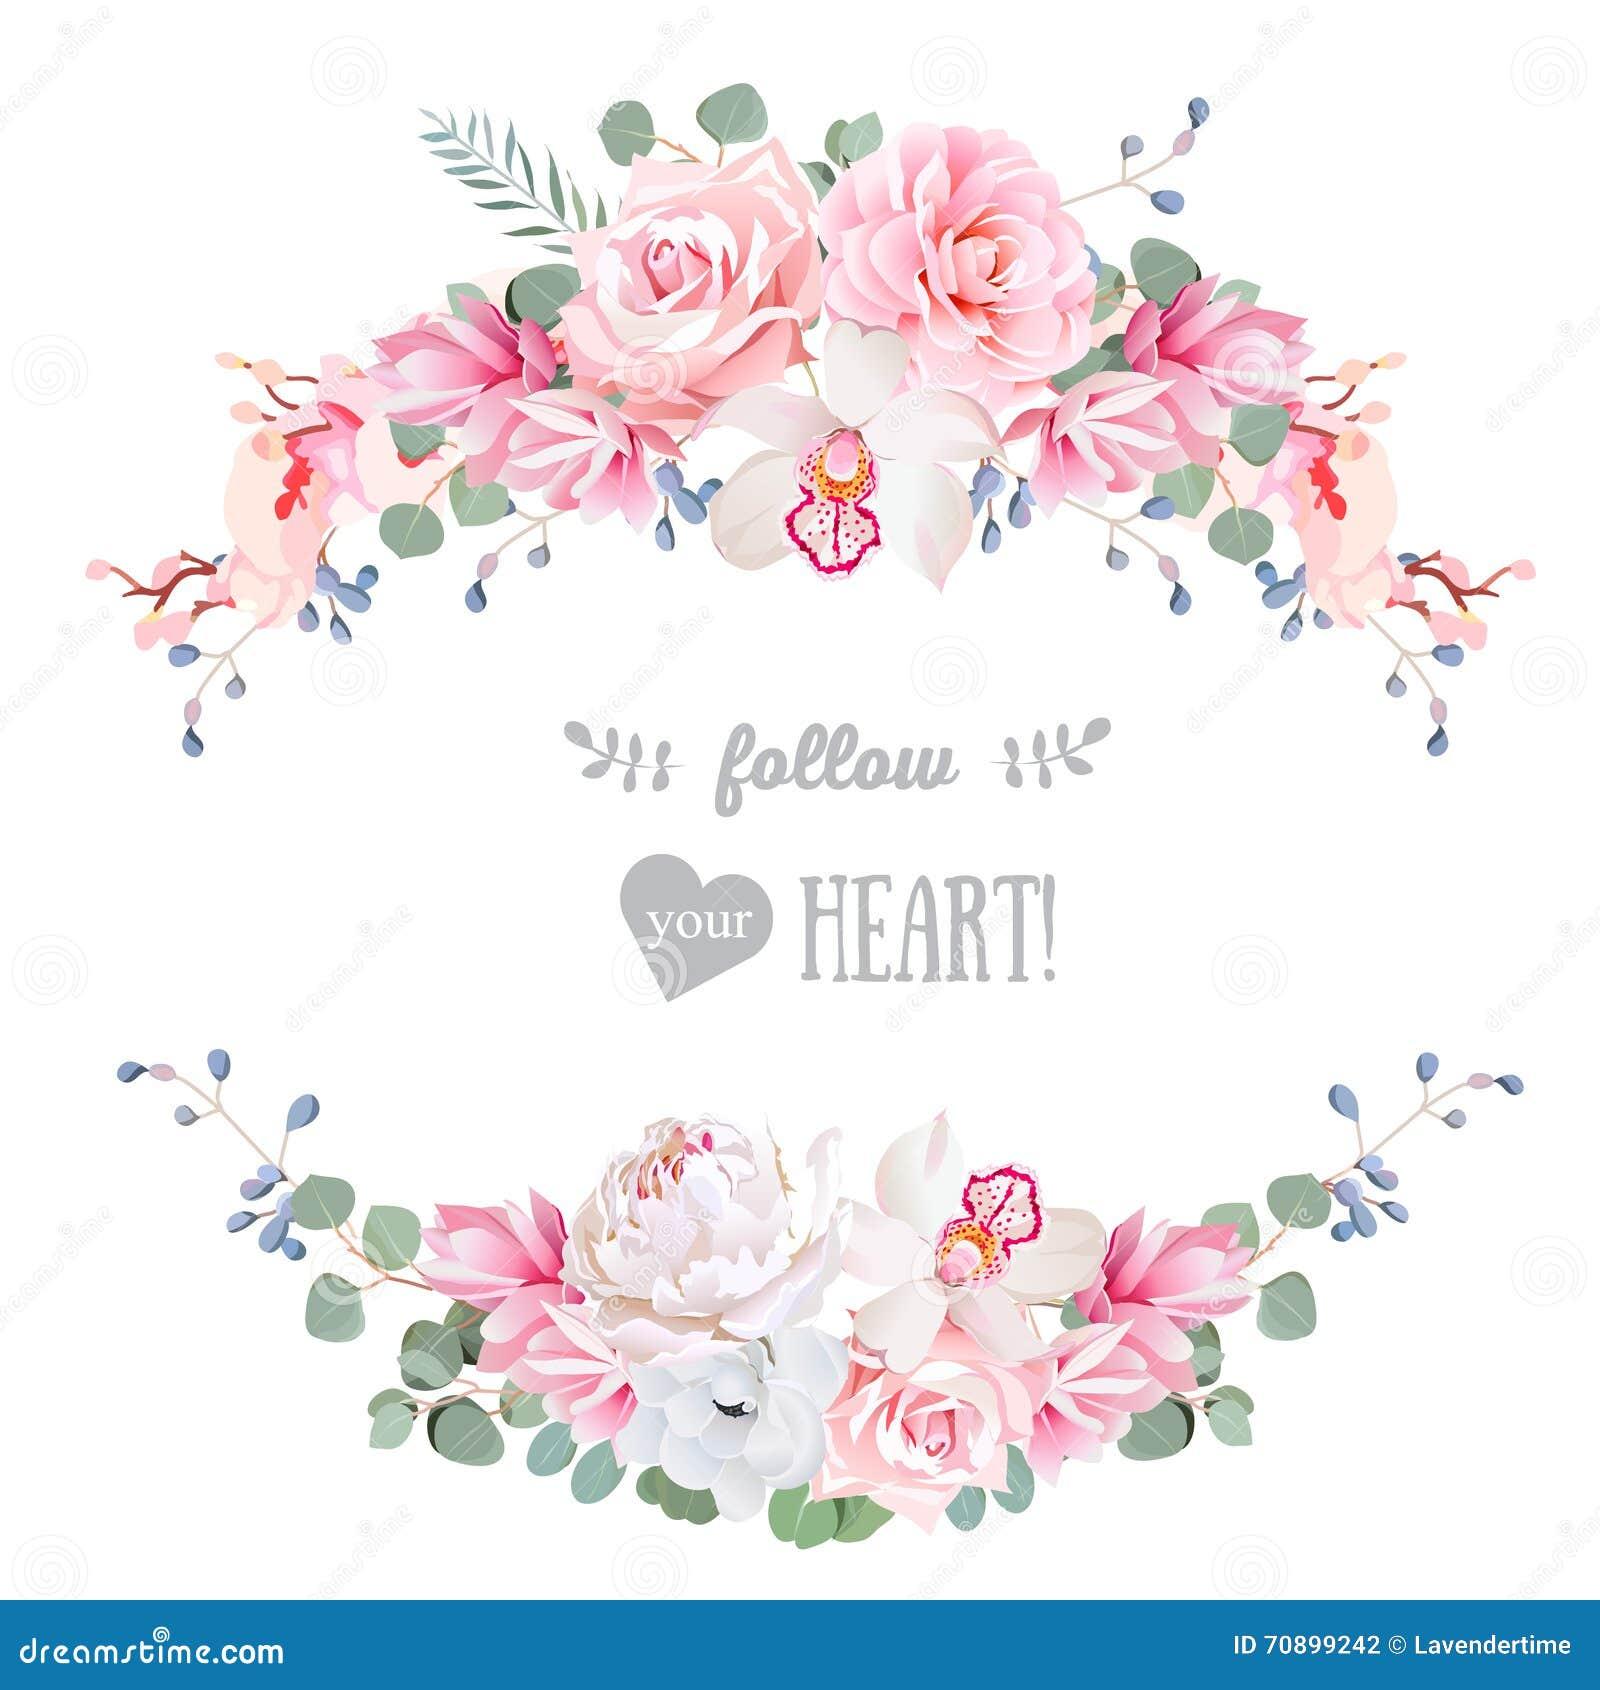 Quadro floral do projeto do vetor do casamento bonito Rosa, peônia, orquídea, anêmona, flores cor-de-rosa, eucaliptus sae